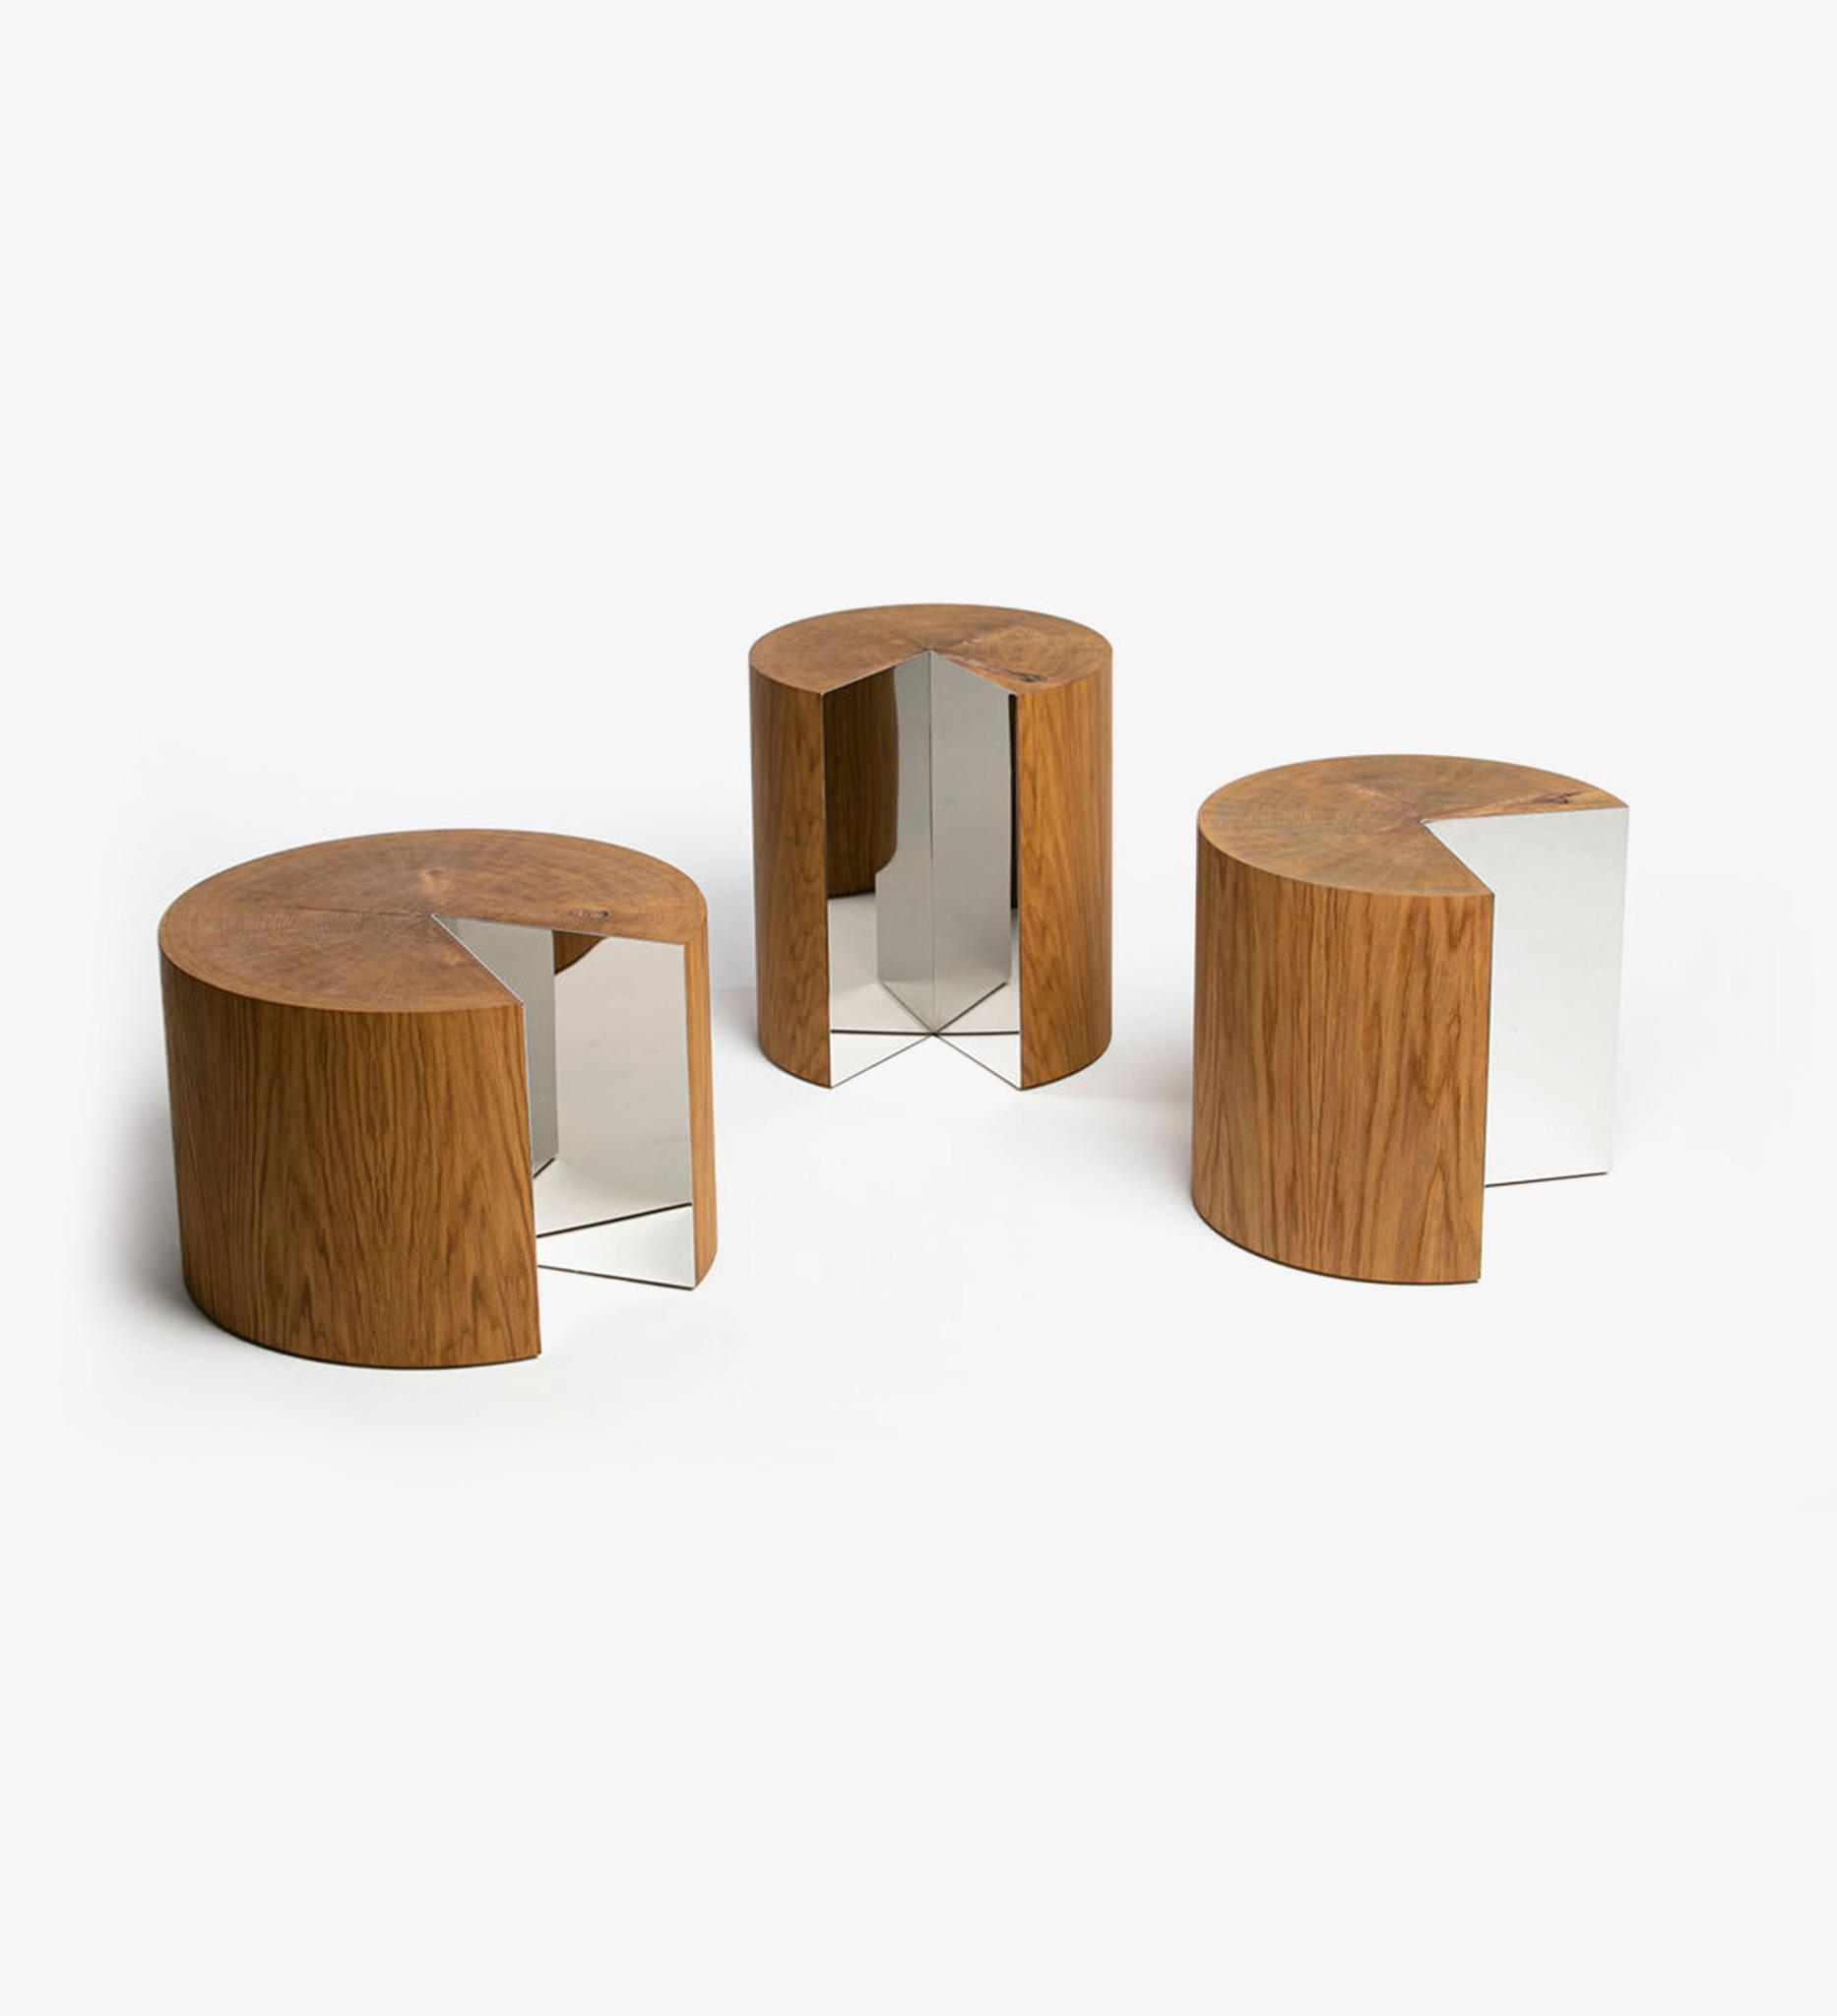 table, bench, stool, oak, steel, functional art, sculpture